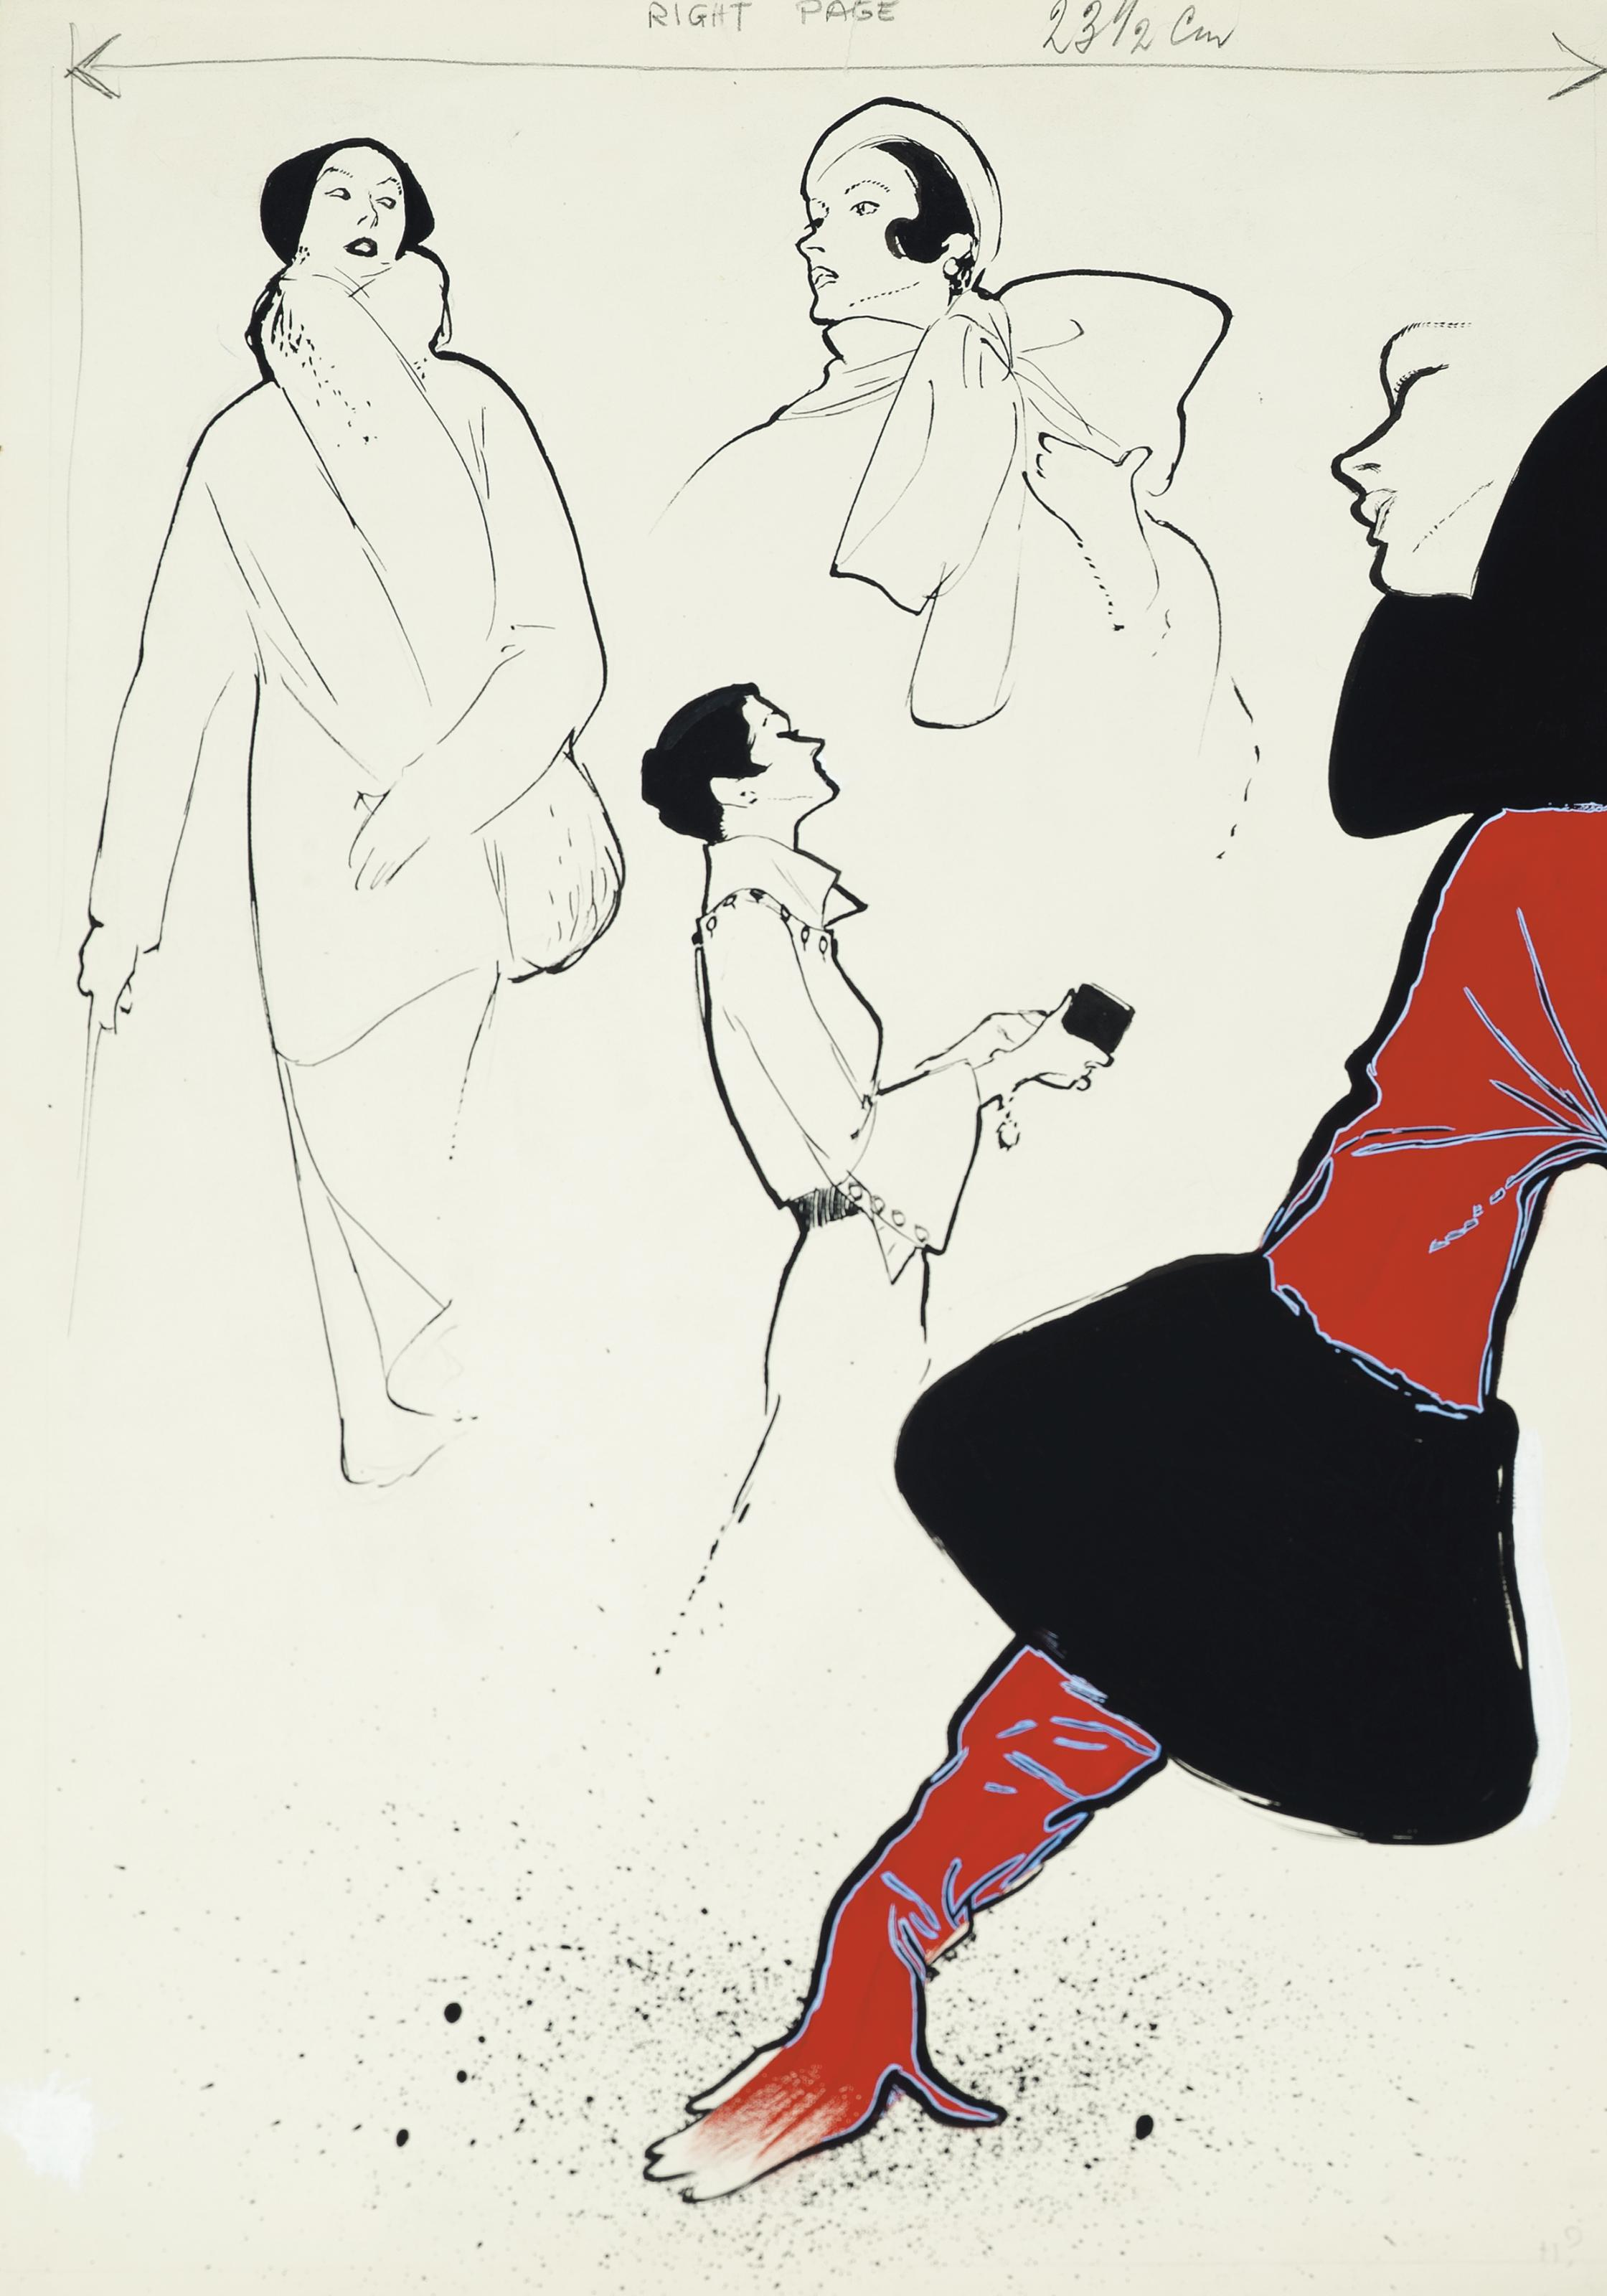 RENÉ GRUAU (1909-2004)